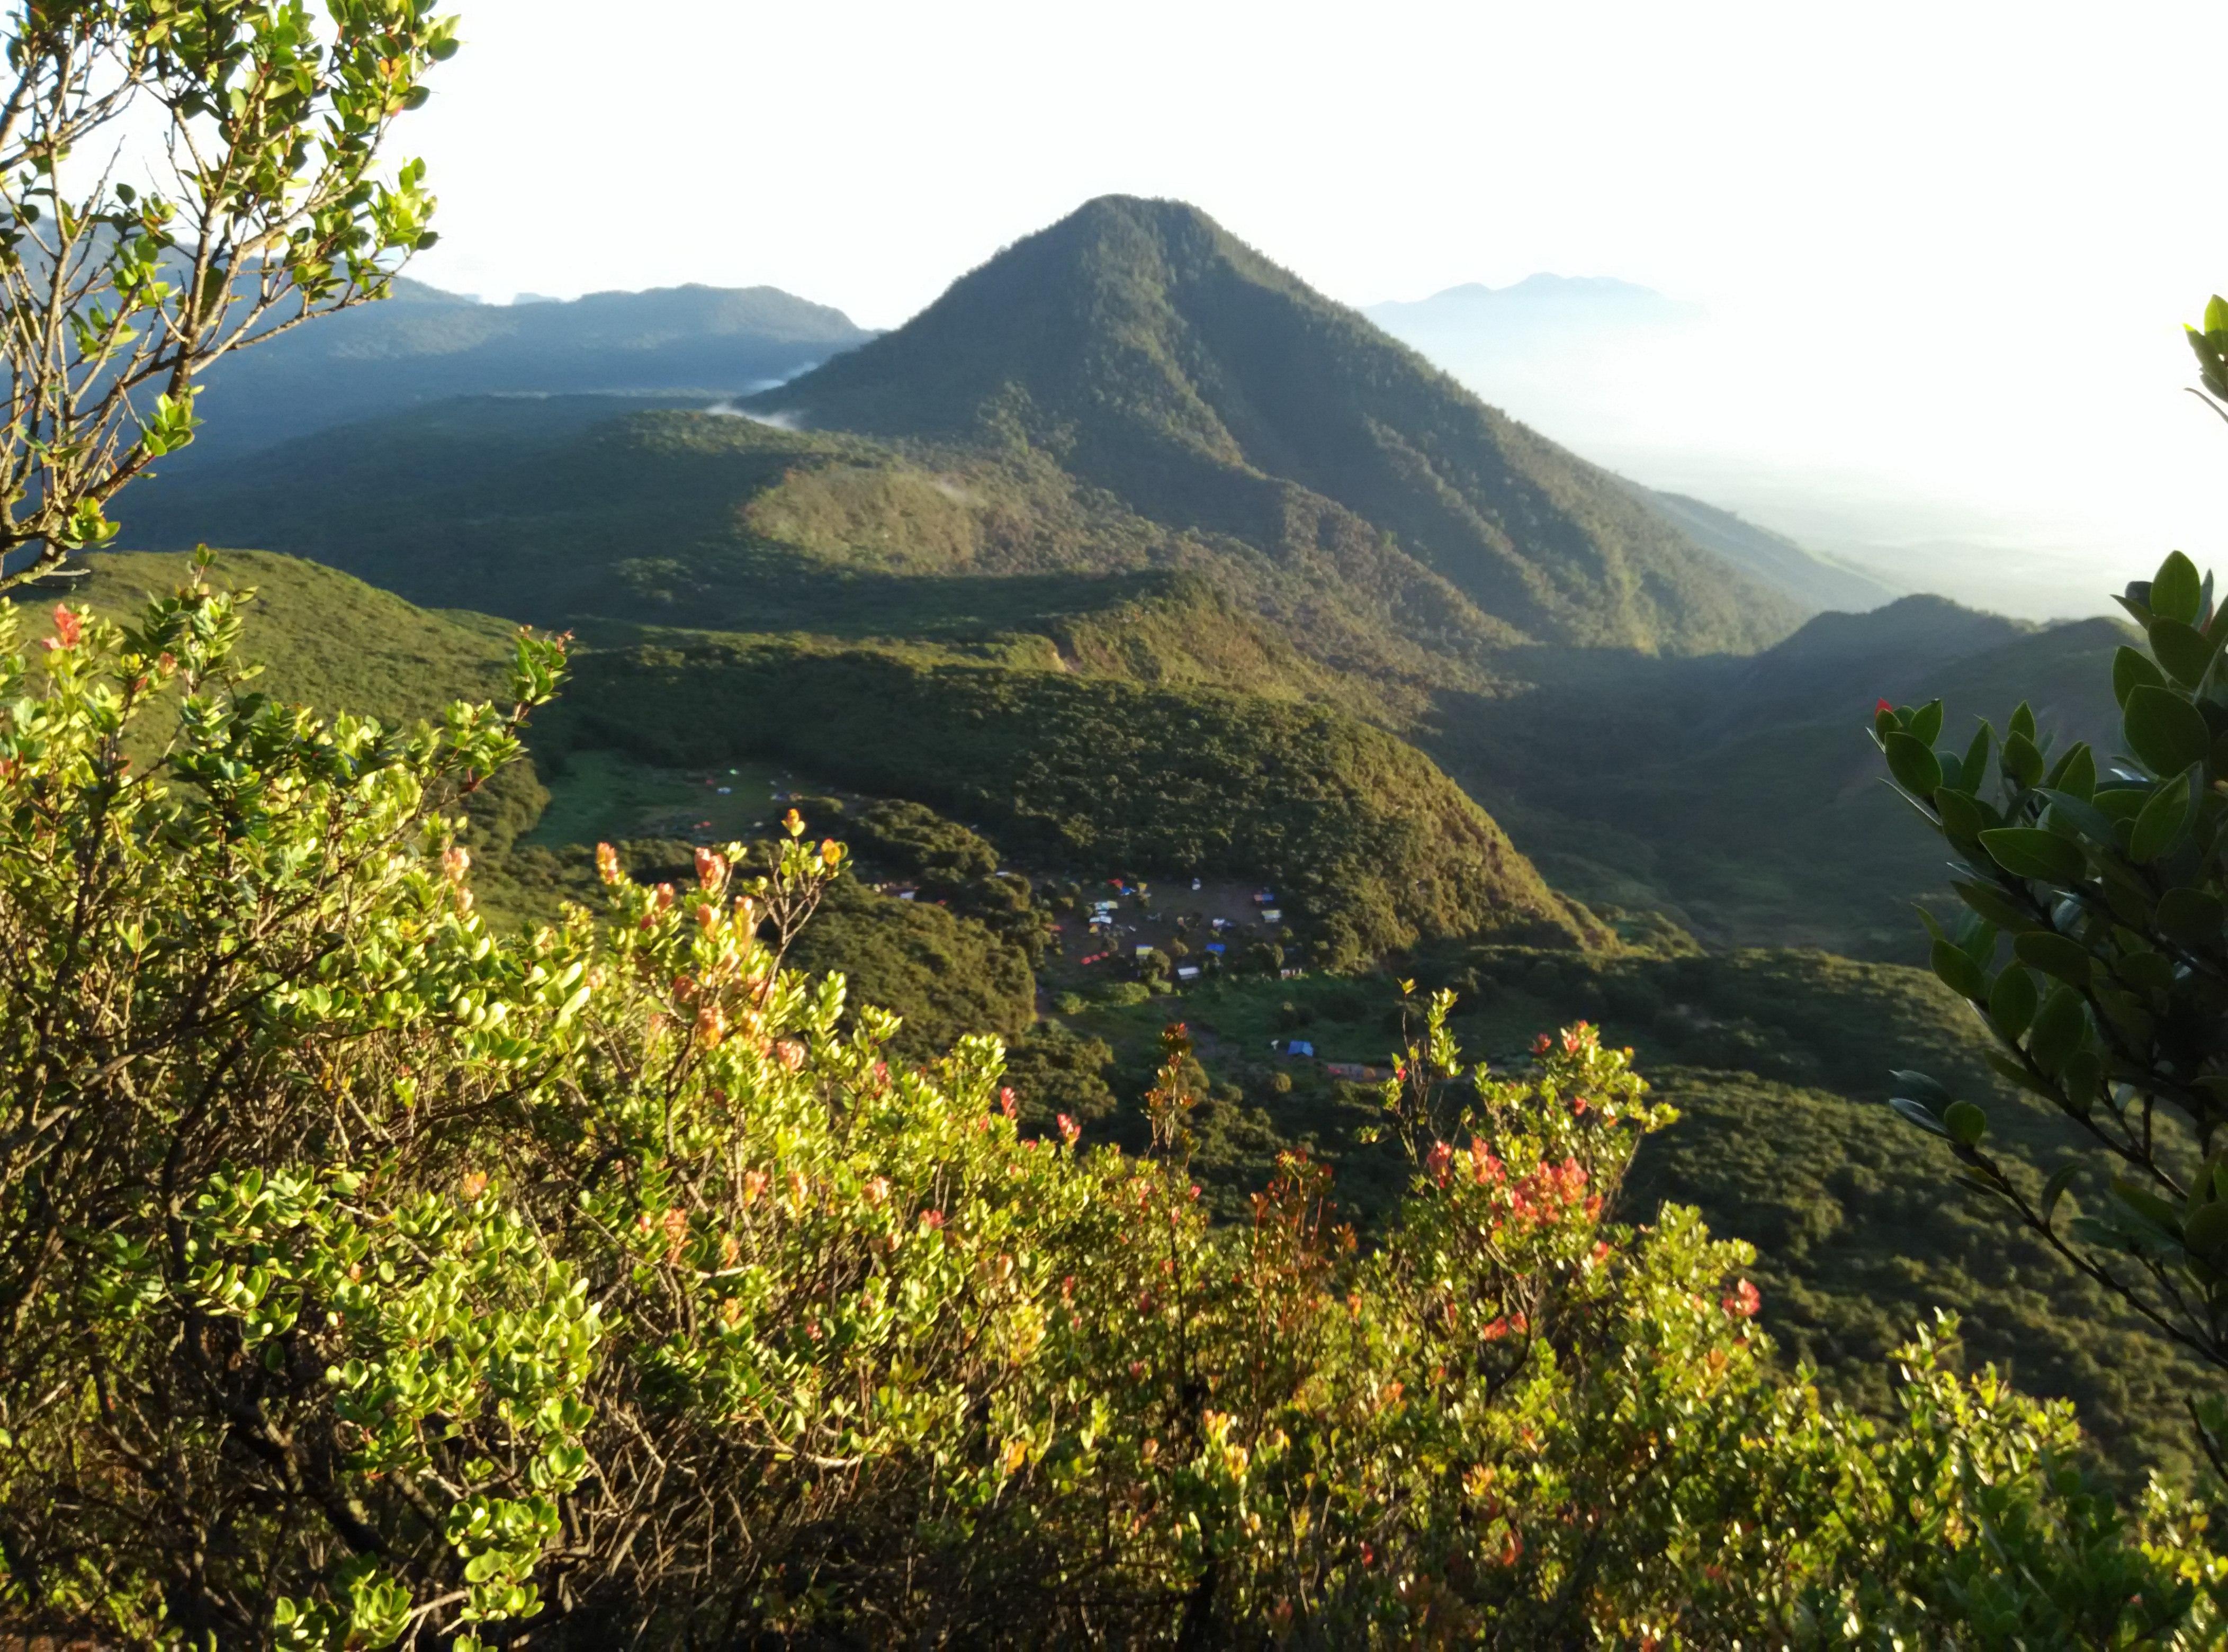 File:Anugrah Tuhan dari puncak gn papandayan jpg - Wikimedia